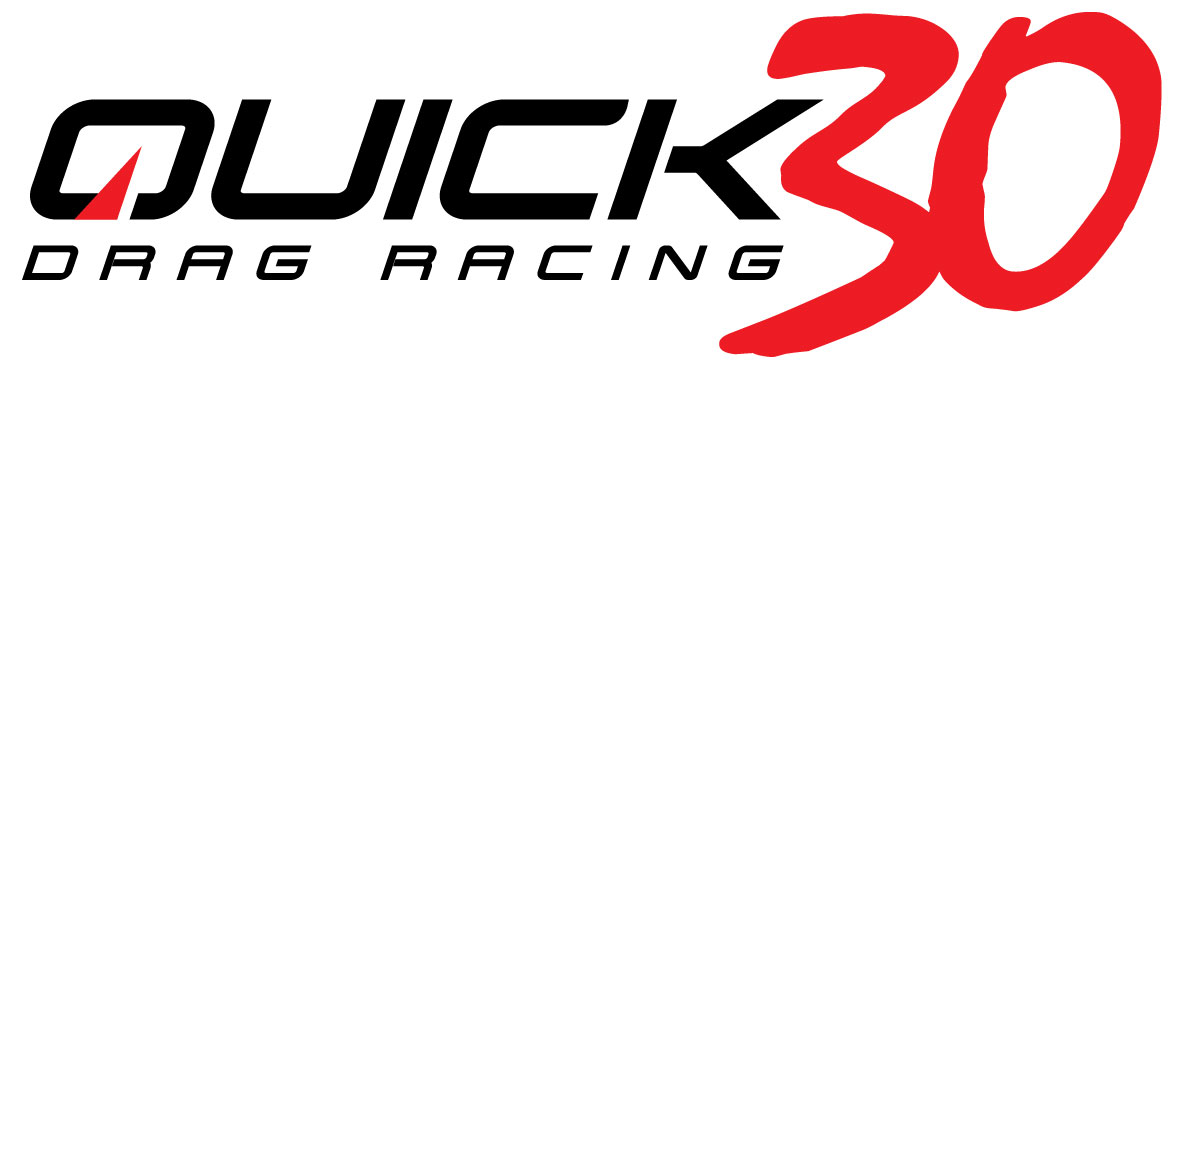 Branding_Quick_30_Large